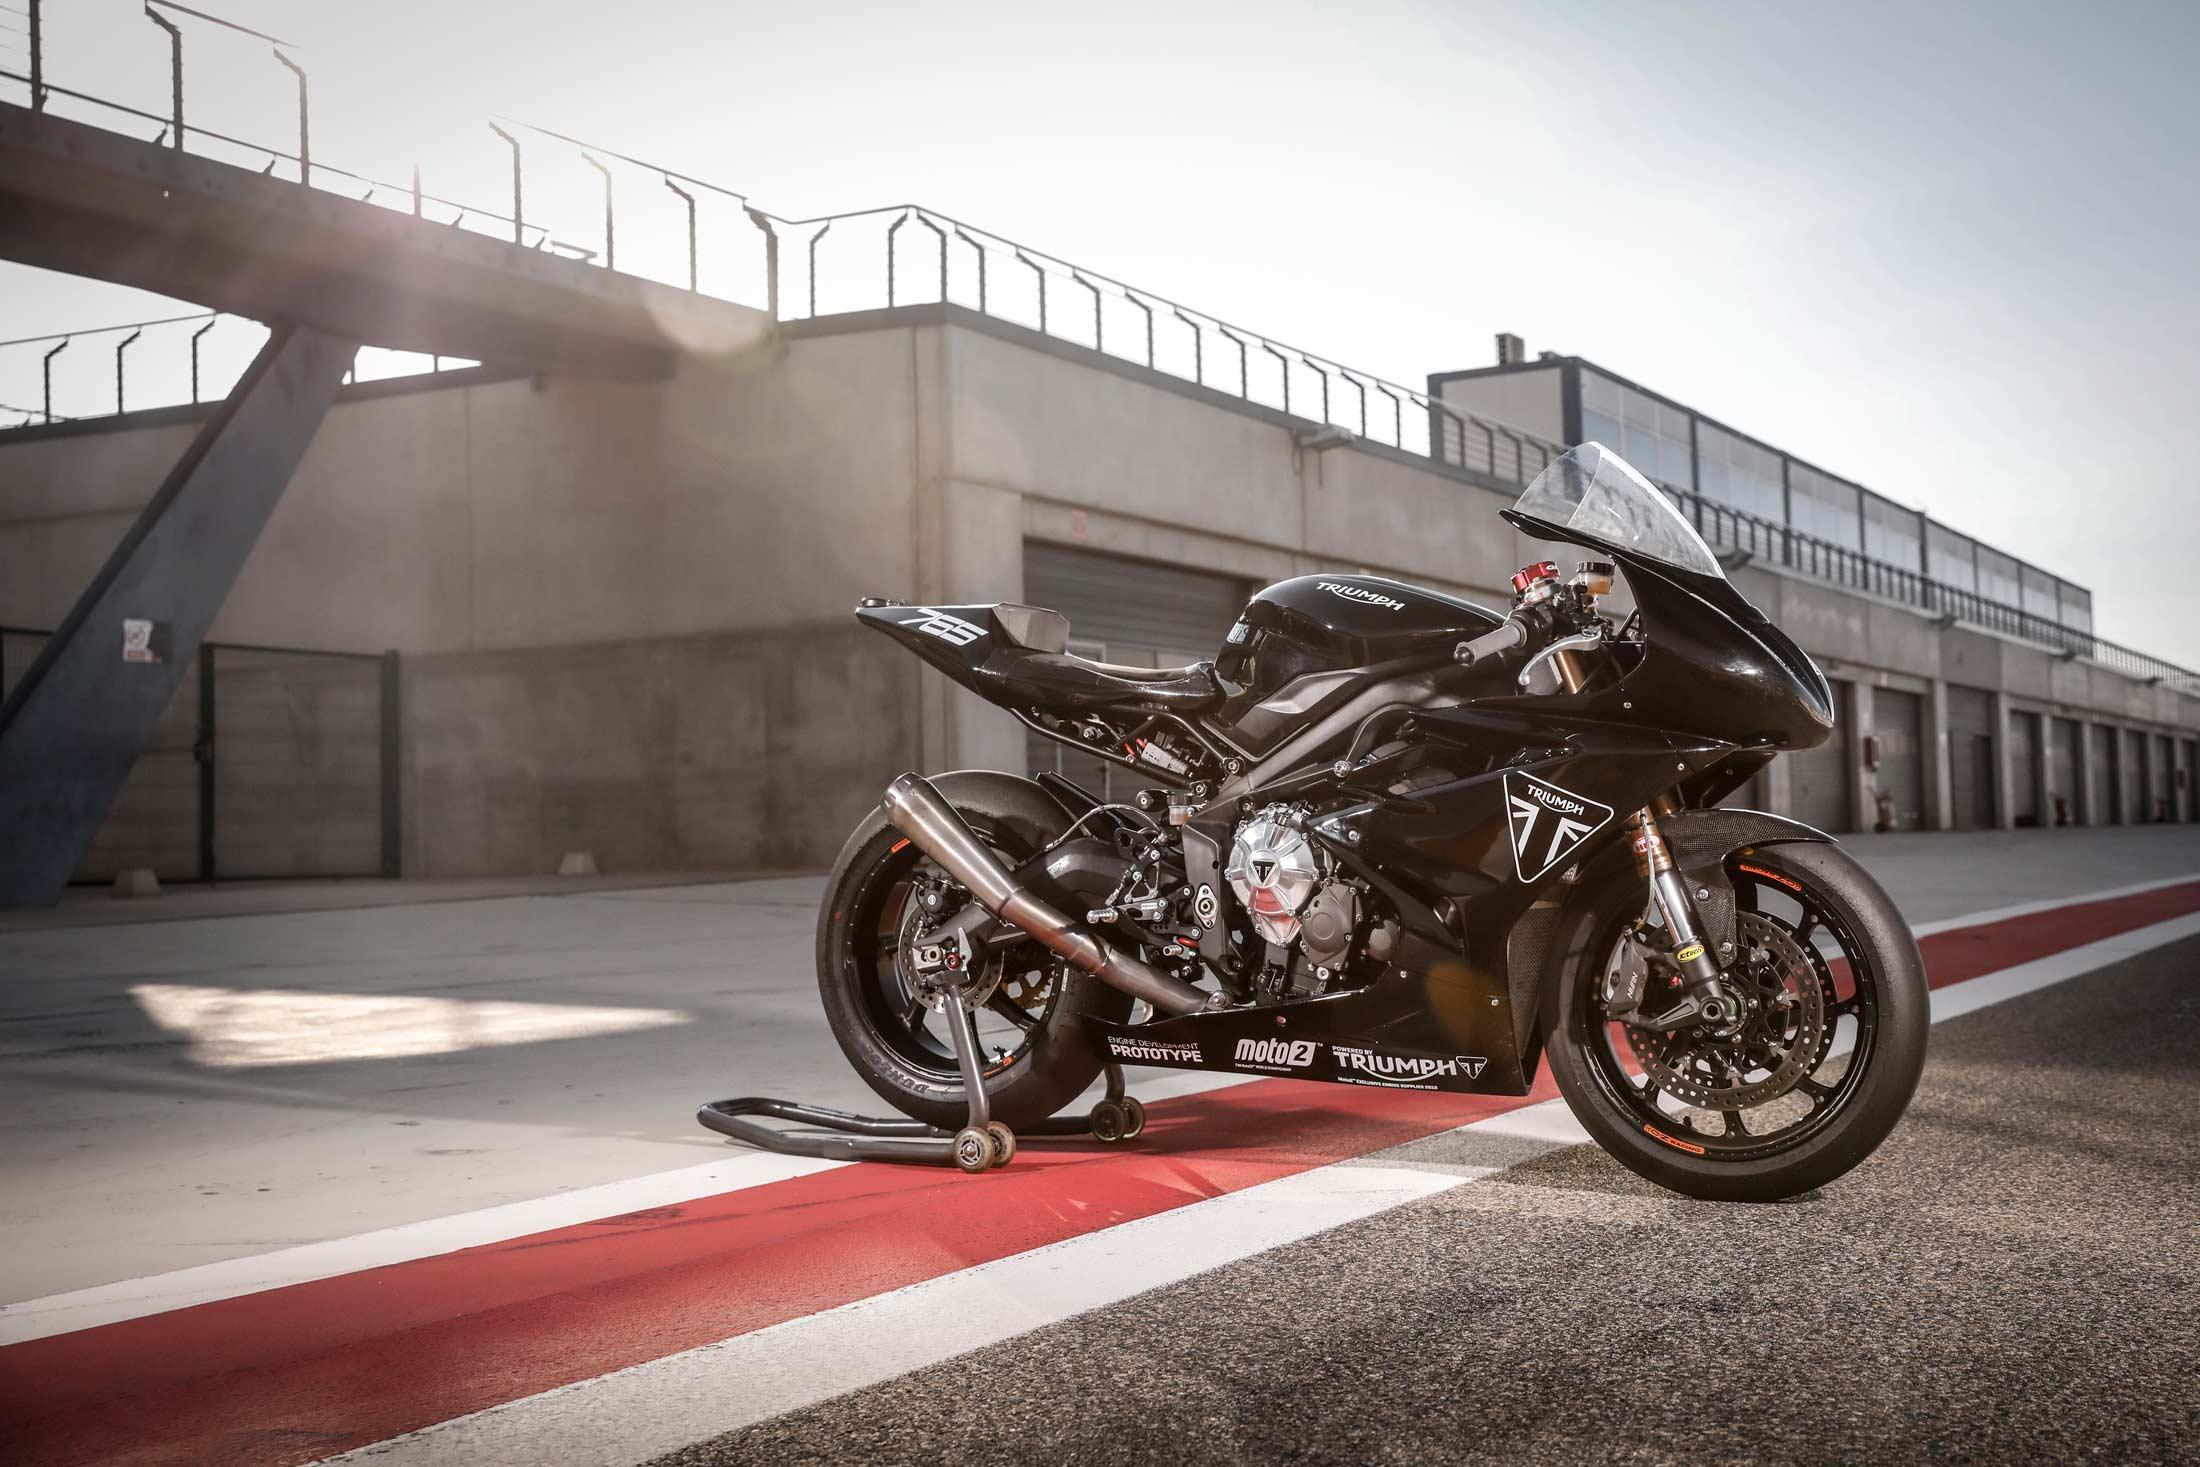 2 Moto angleterre occasion et moto occasion Triumph - Moto angleterre occasion et moto occasion Triumph